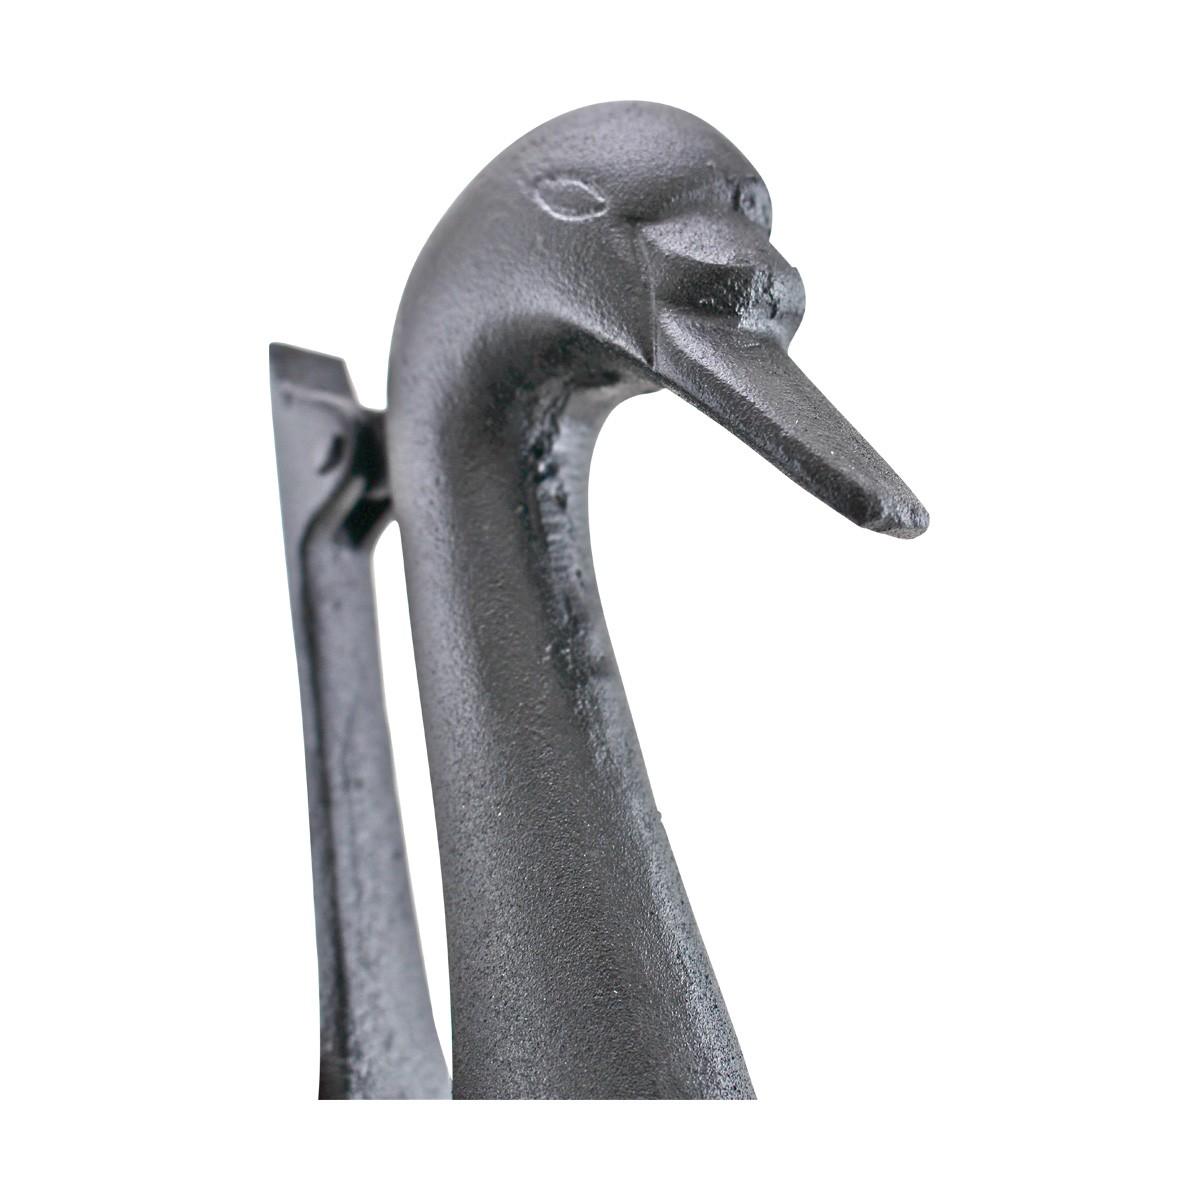 Door Knocker Swan Black Cast Iron 7 H x 3 78 W Iron Door Knocker Black Swan Door Knocker Cast iron Door Knockers